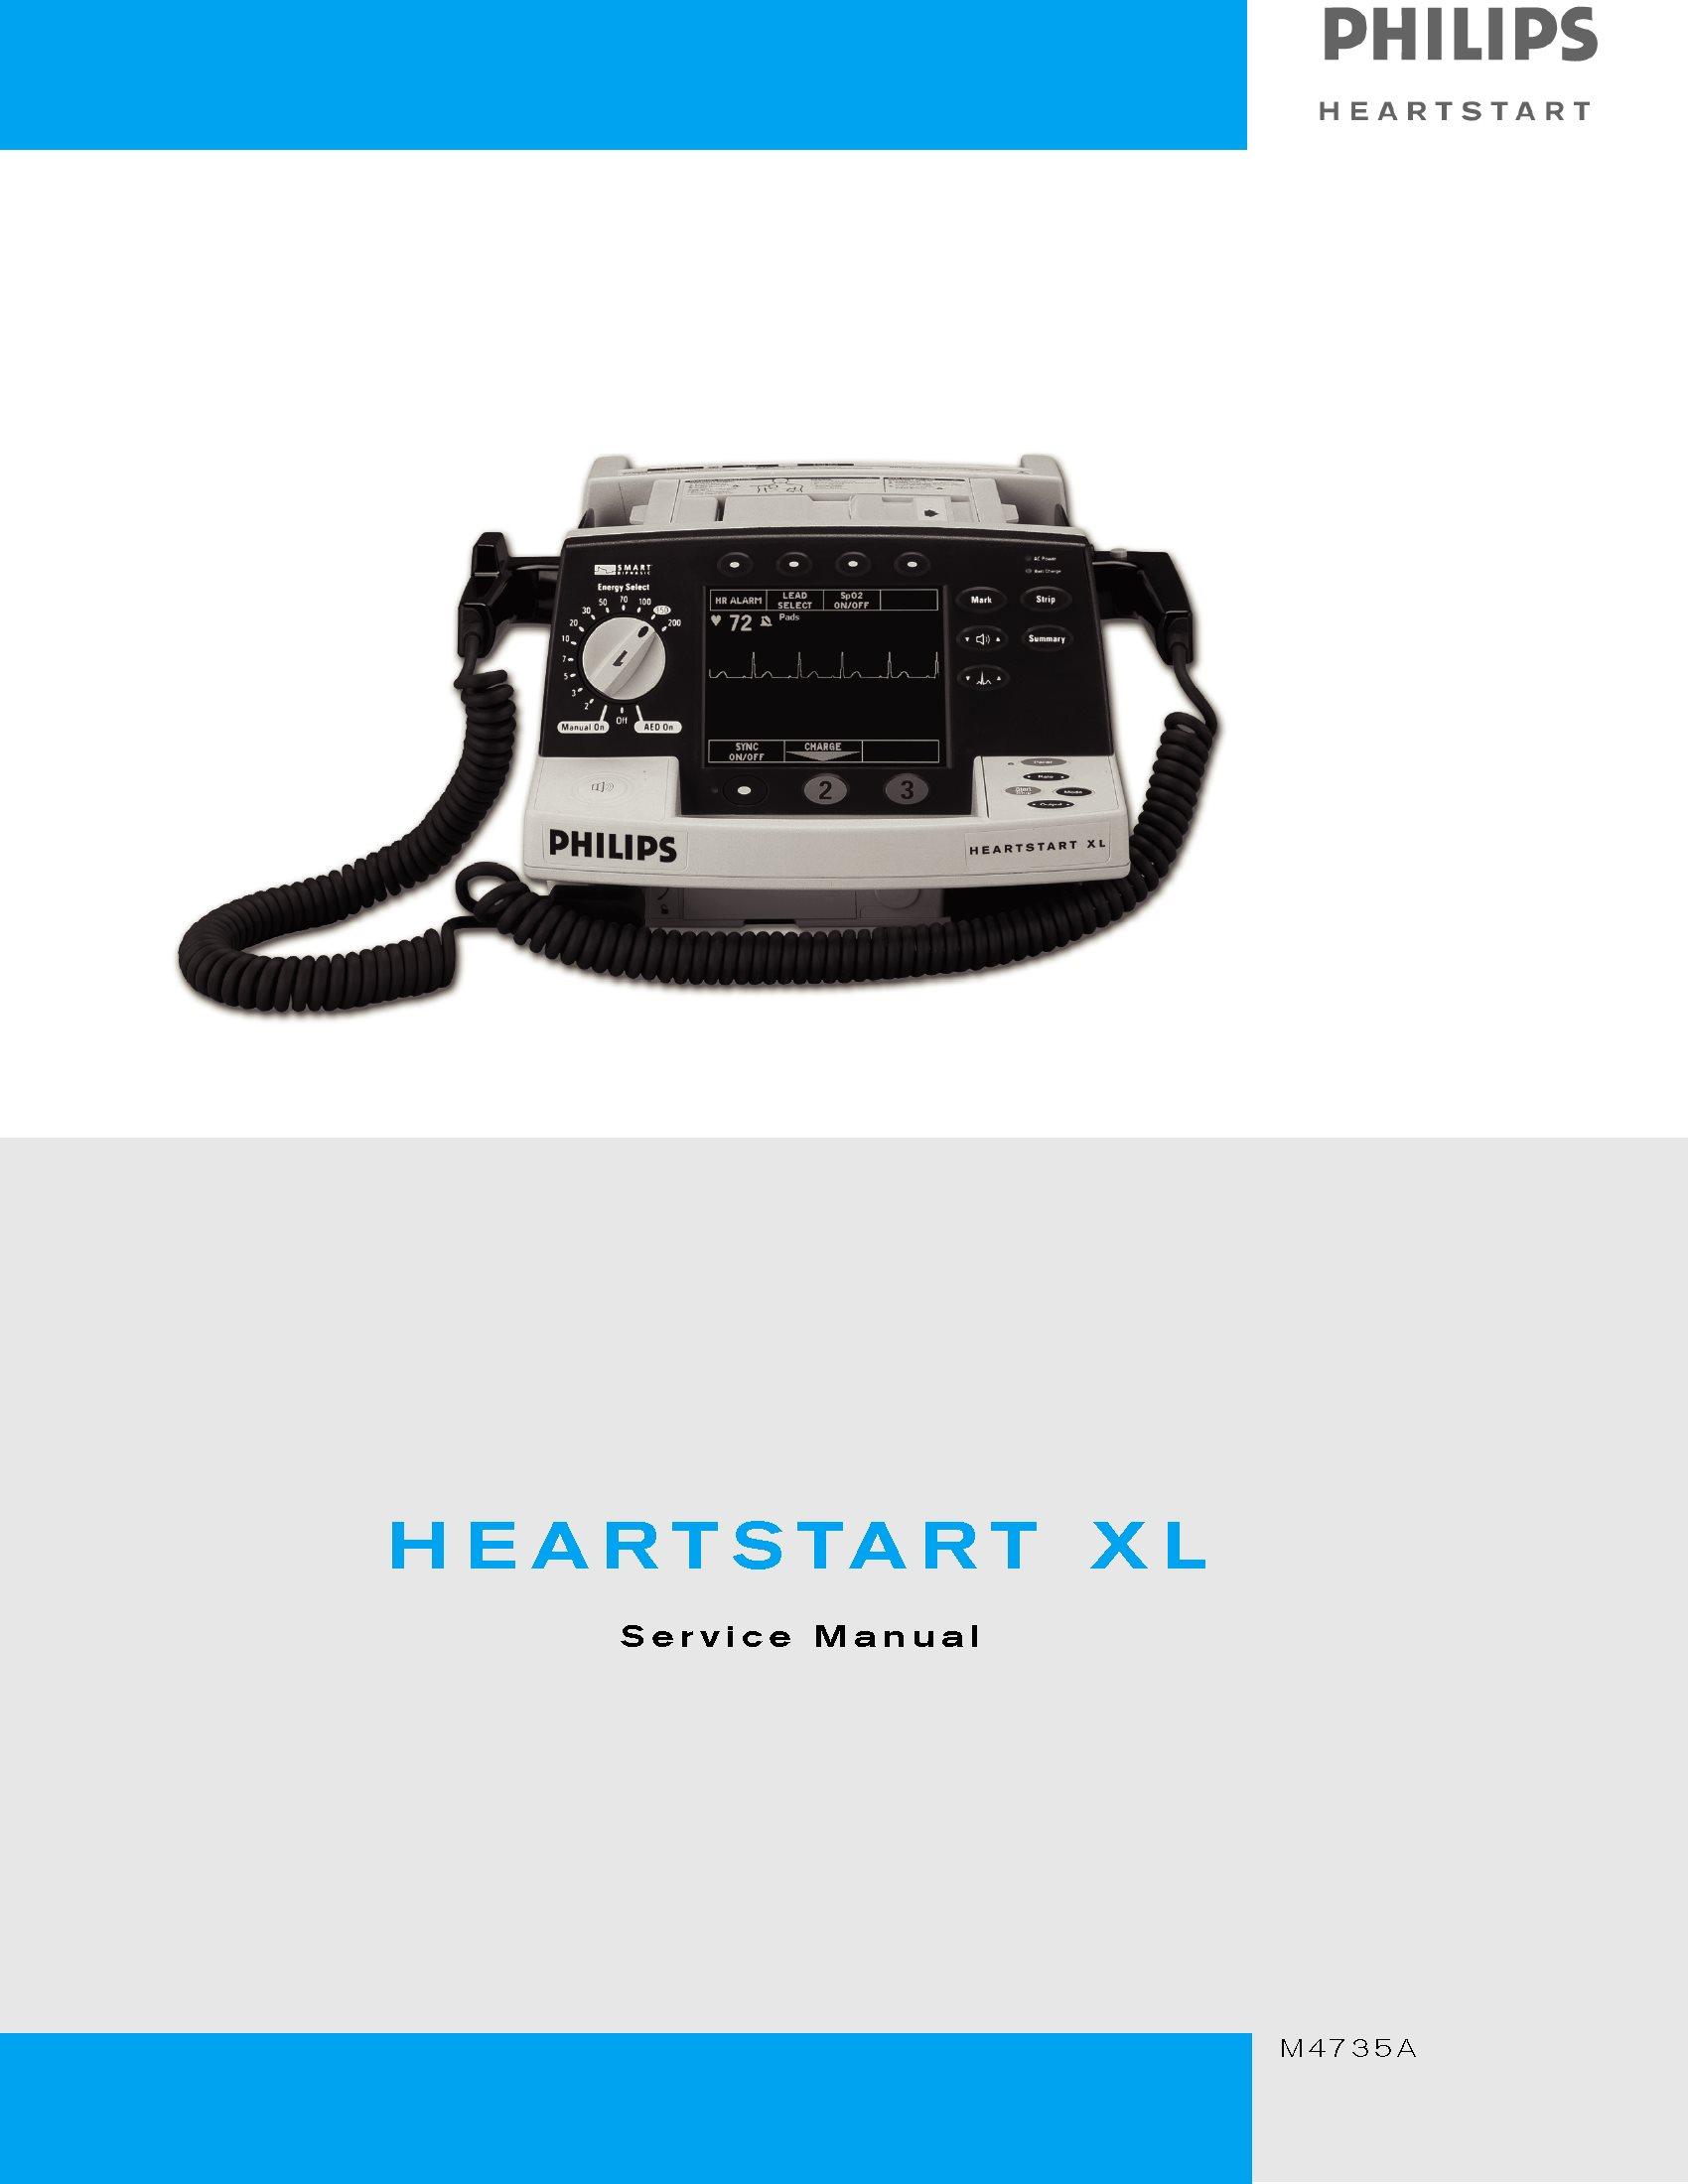 Philips HEARTSTART XL Service Manual